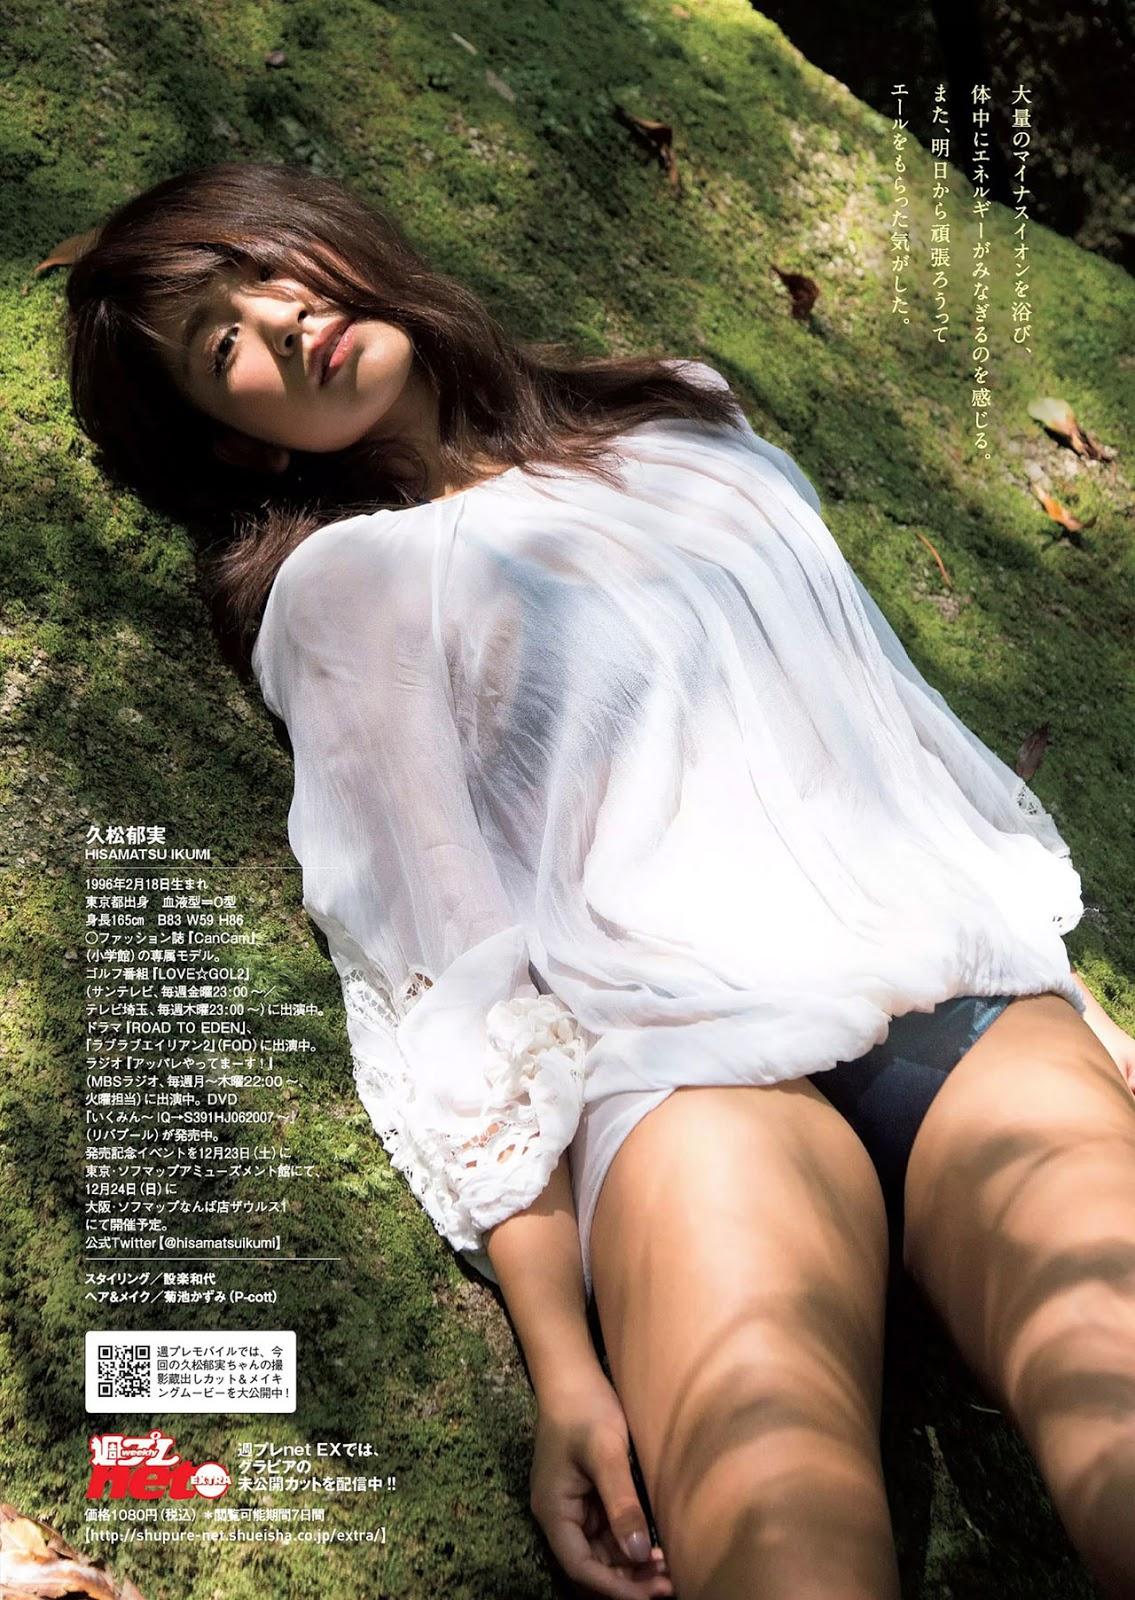 Ikumi Hisamatsu 久松郁実, Weekly Playboy 2017 No.52 (週刊プレイボーイ 2017年52号)